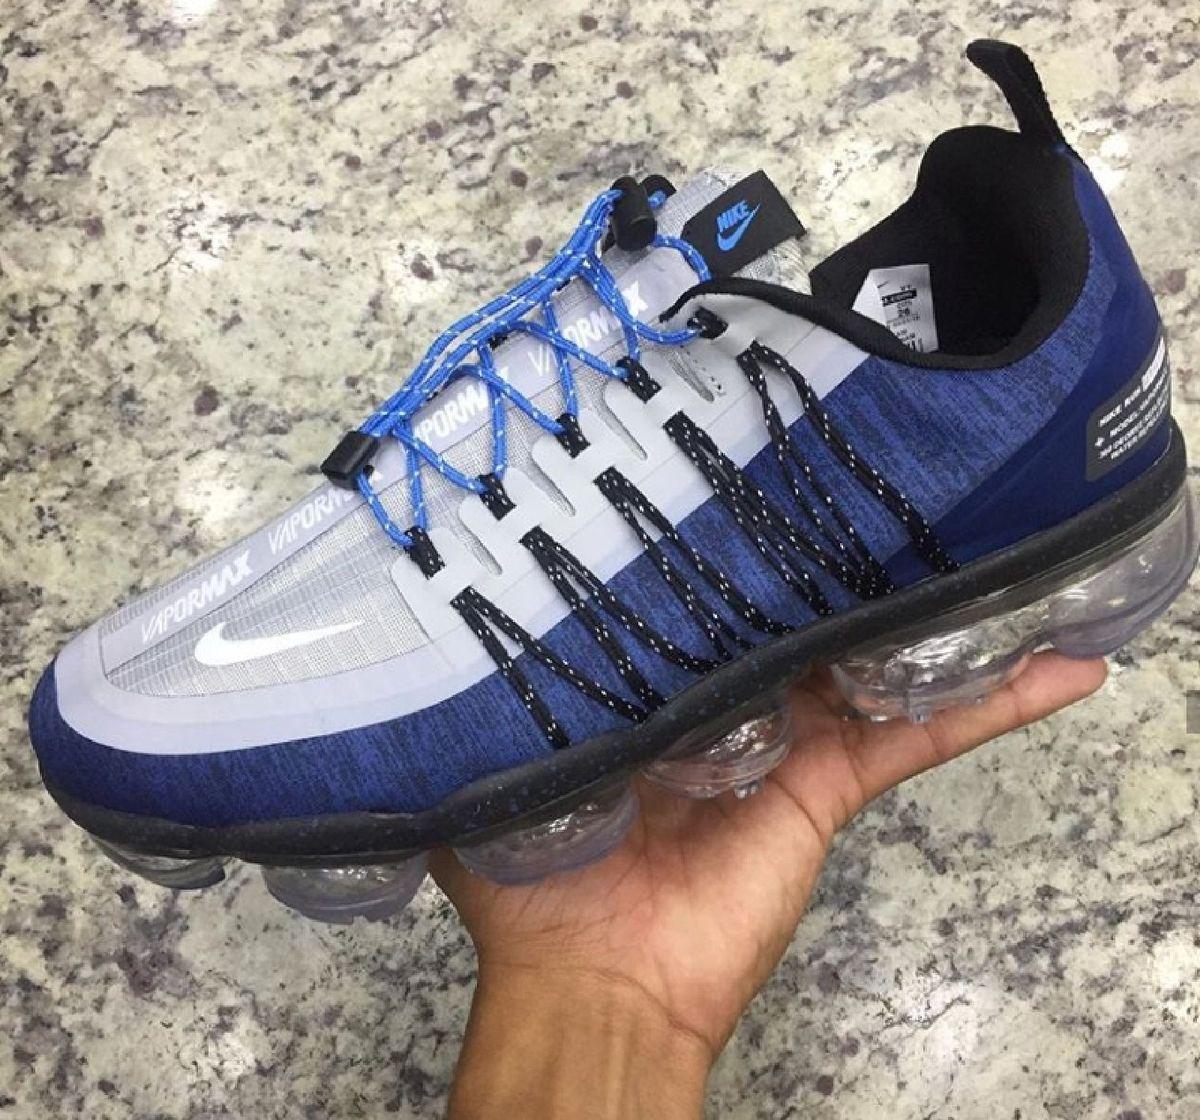 Jual Promo Nike Air Vapormax Plus Running Shoes For